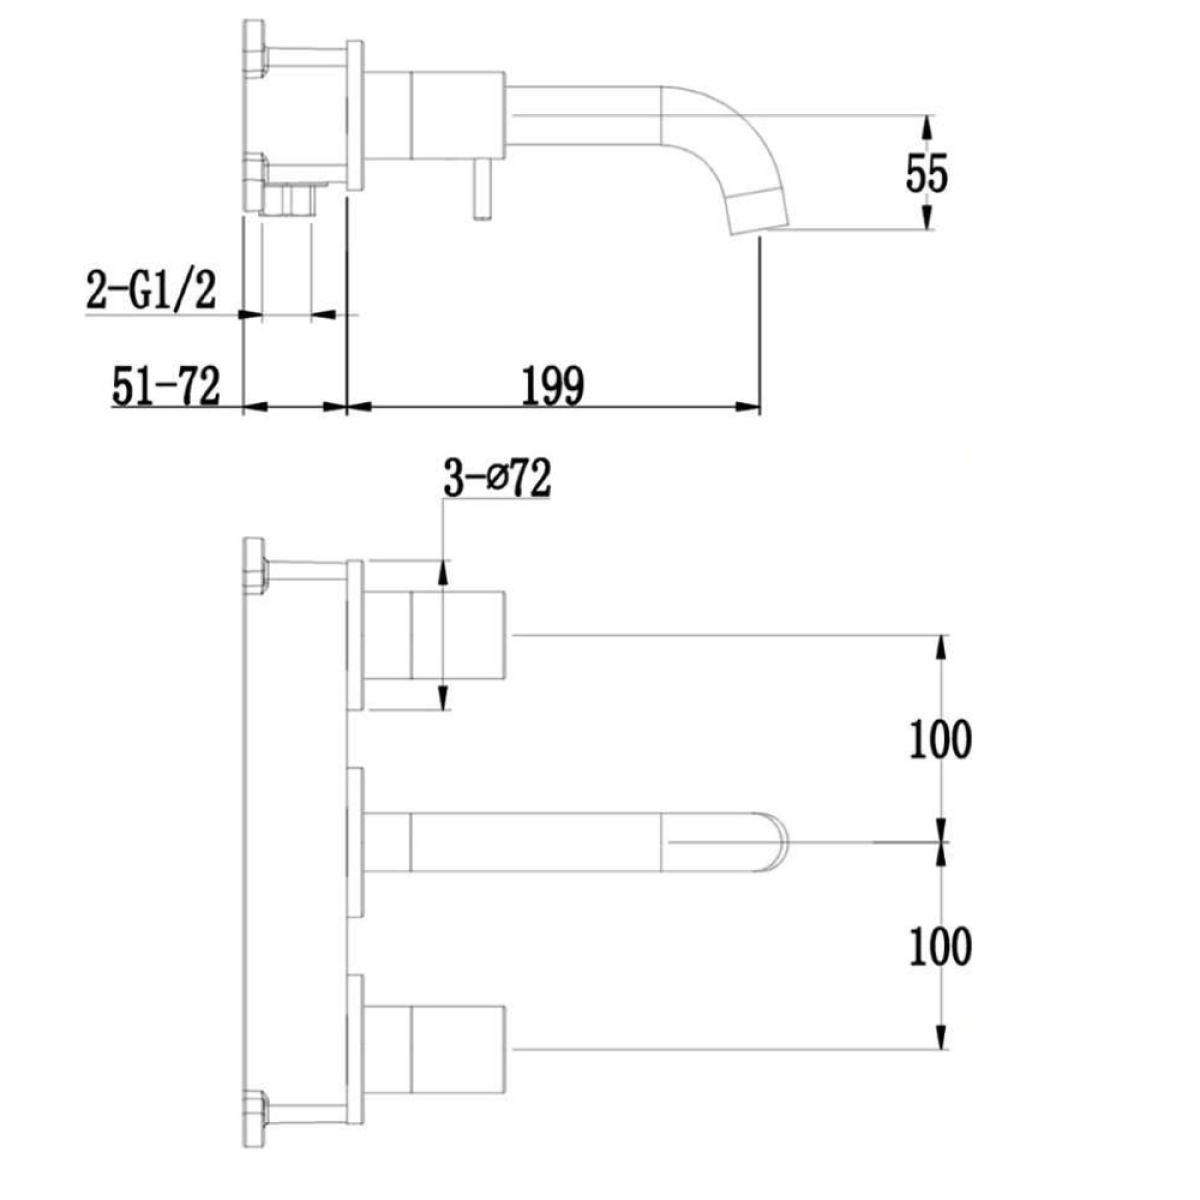 RAK Prima Tech Wall Mounted 3 Hole Basin Mixer Tap Measurements